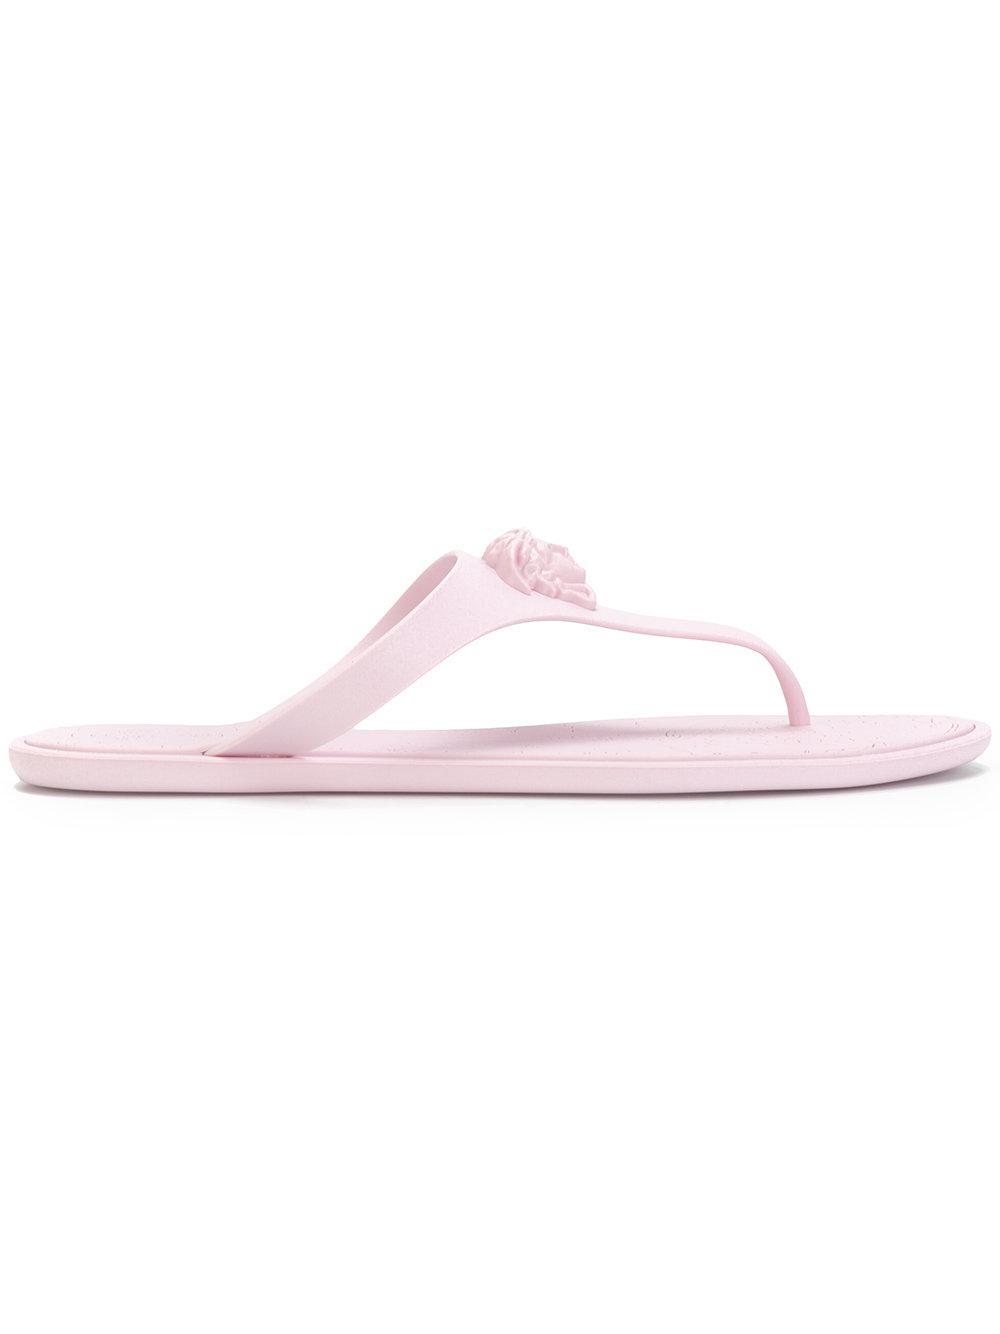 e37583dd929 Medusa thong Purple Pink crystal Versace sandals amp  4rpn4--pisa ...